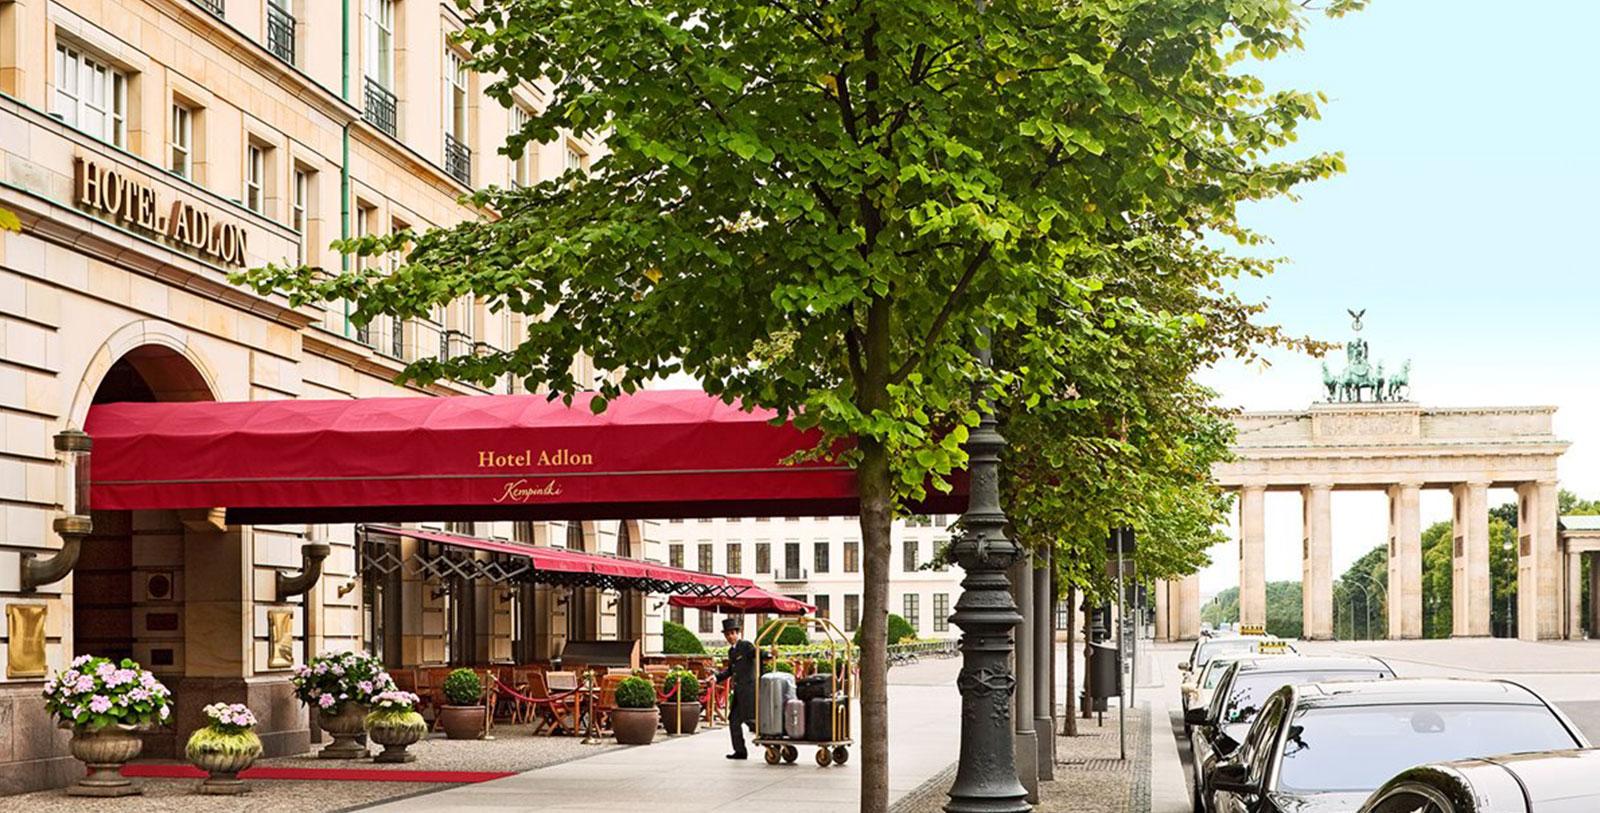 Image of Exterior, Hotel Adlon Kempinski, Berlin, Germany, 1907, Member of Historic Hotels Worldwide, Overview